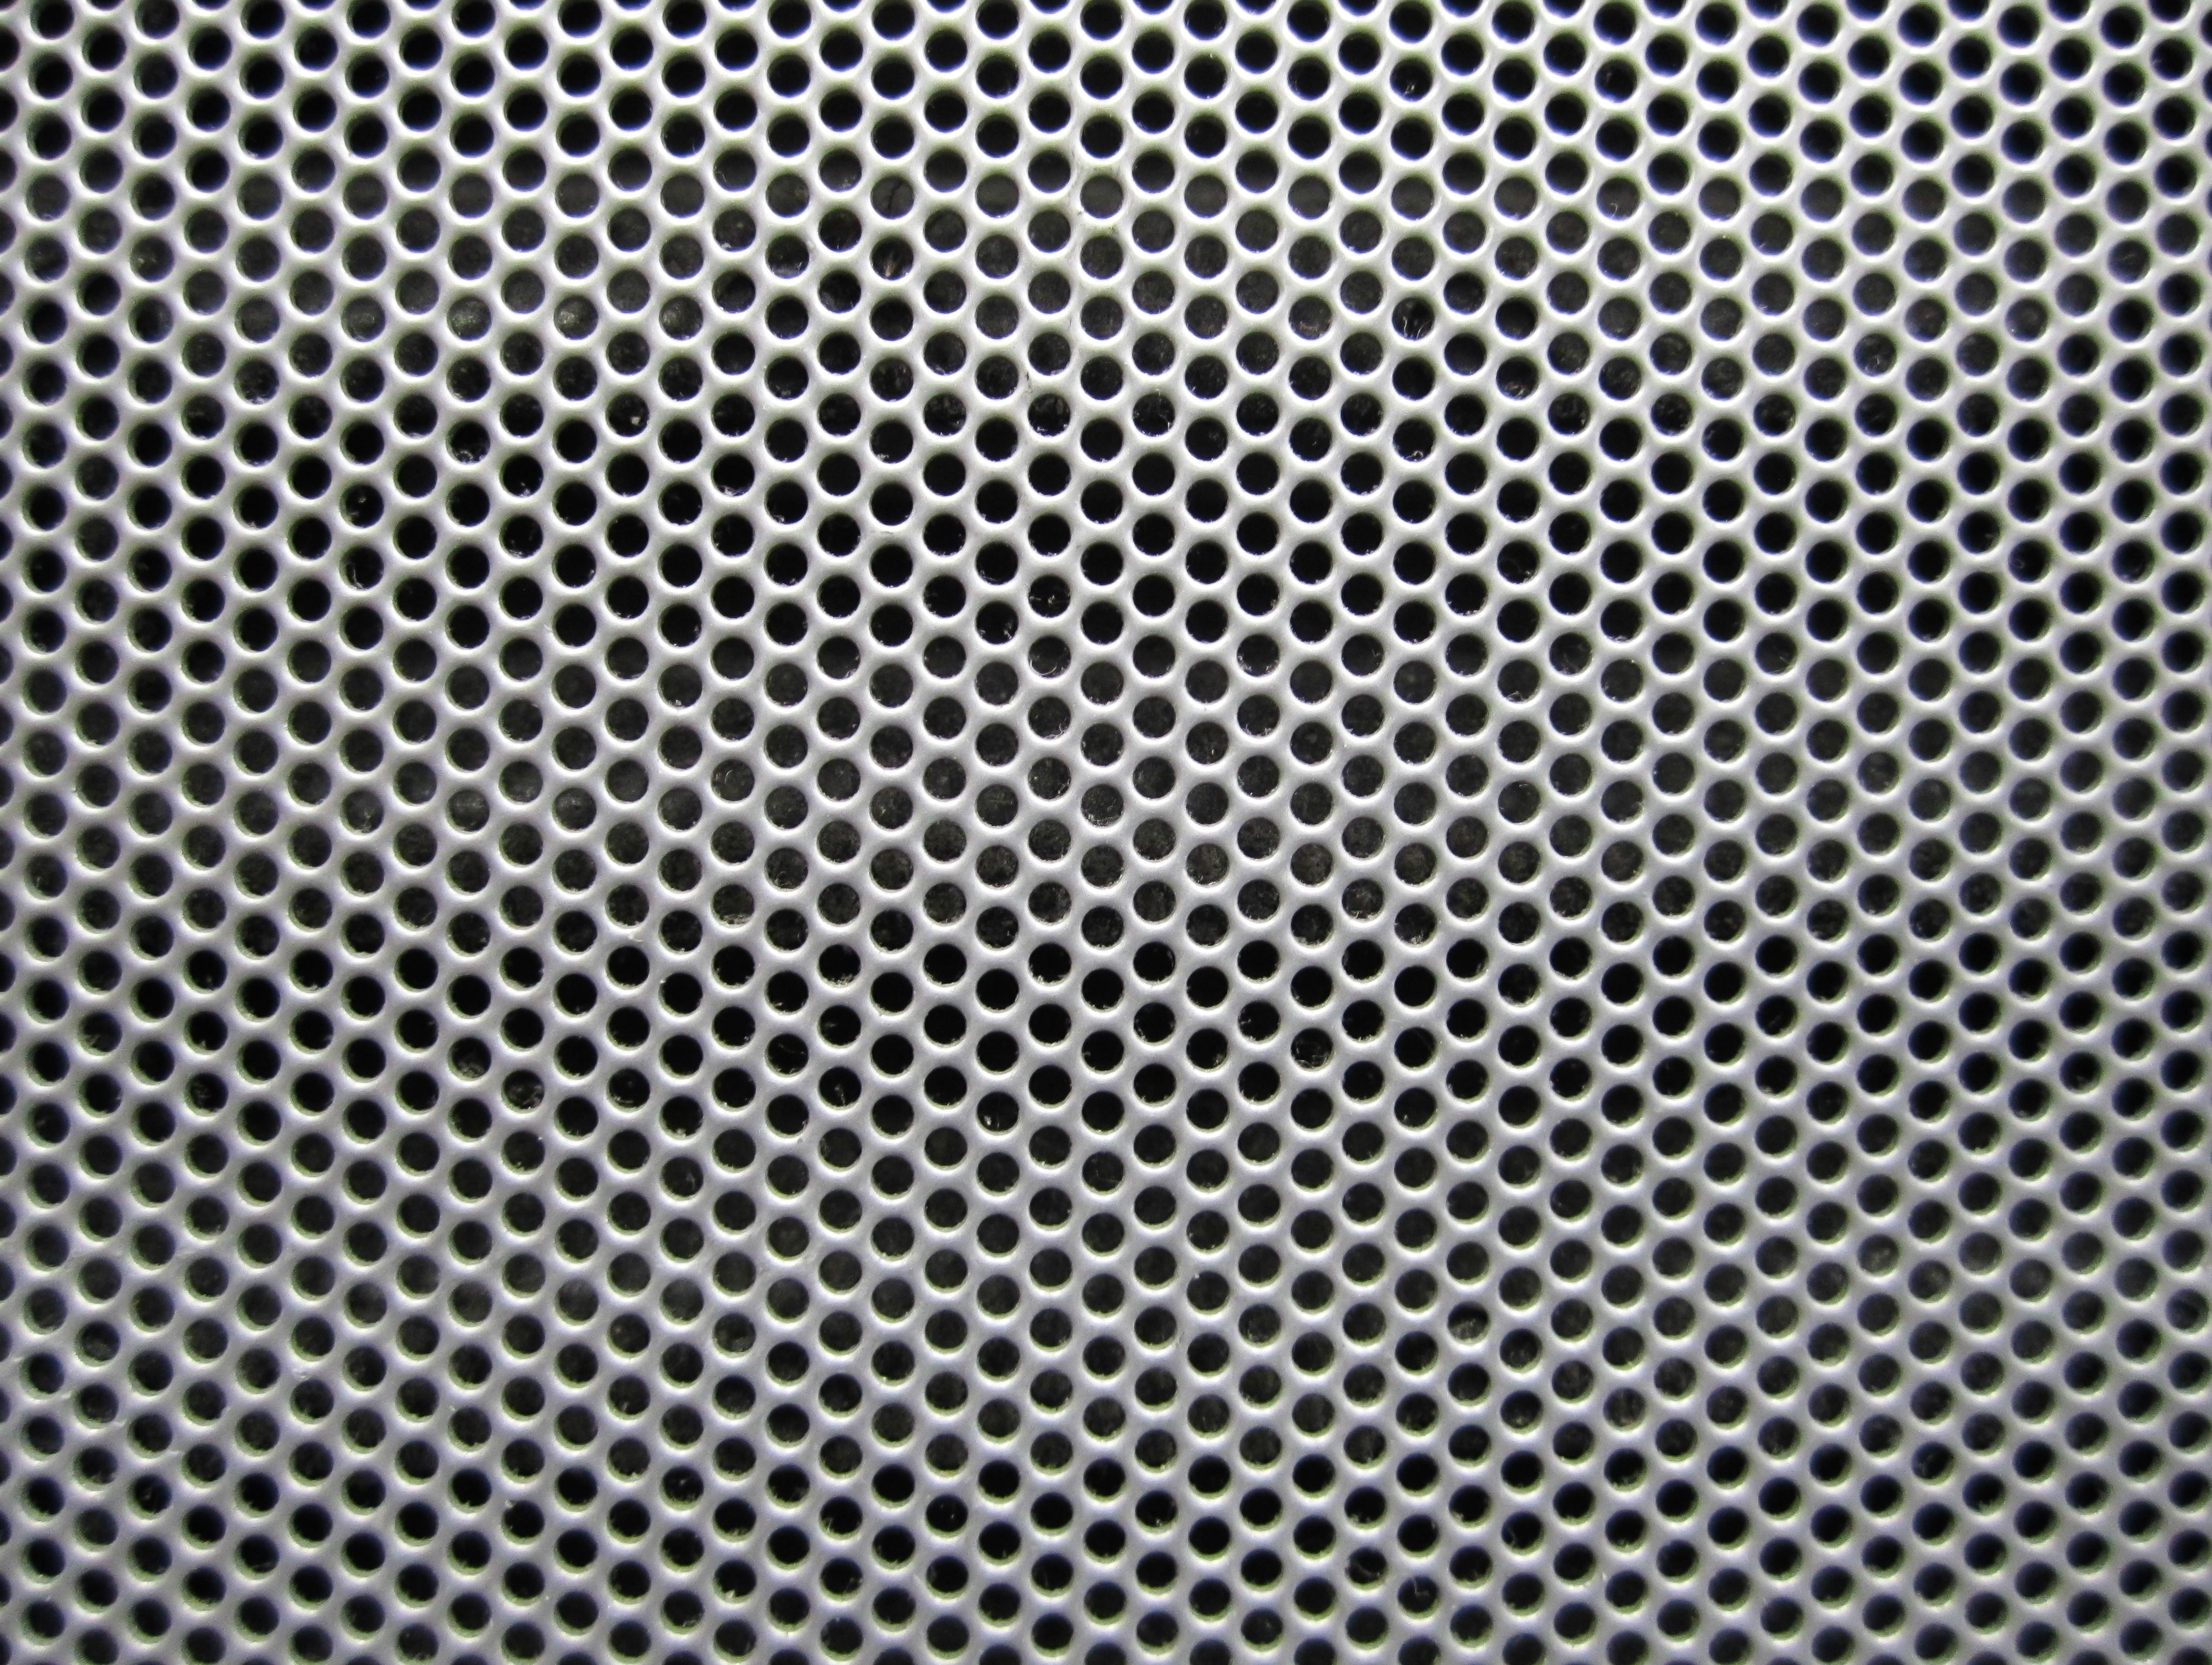 Metal Texture Hole Dusty Stock Photo Wallpaper Grey Jpg